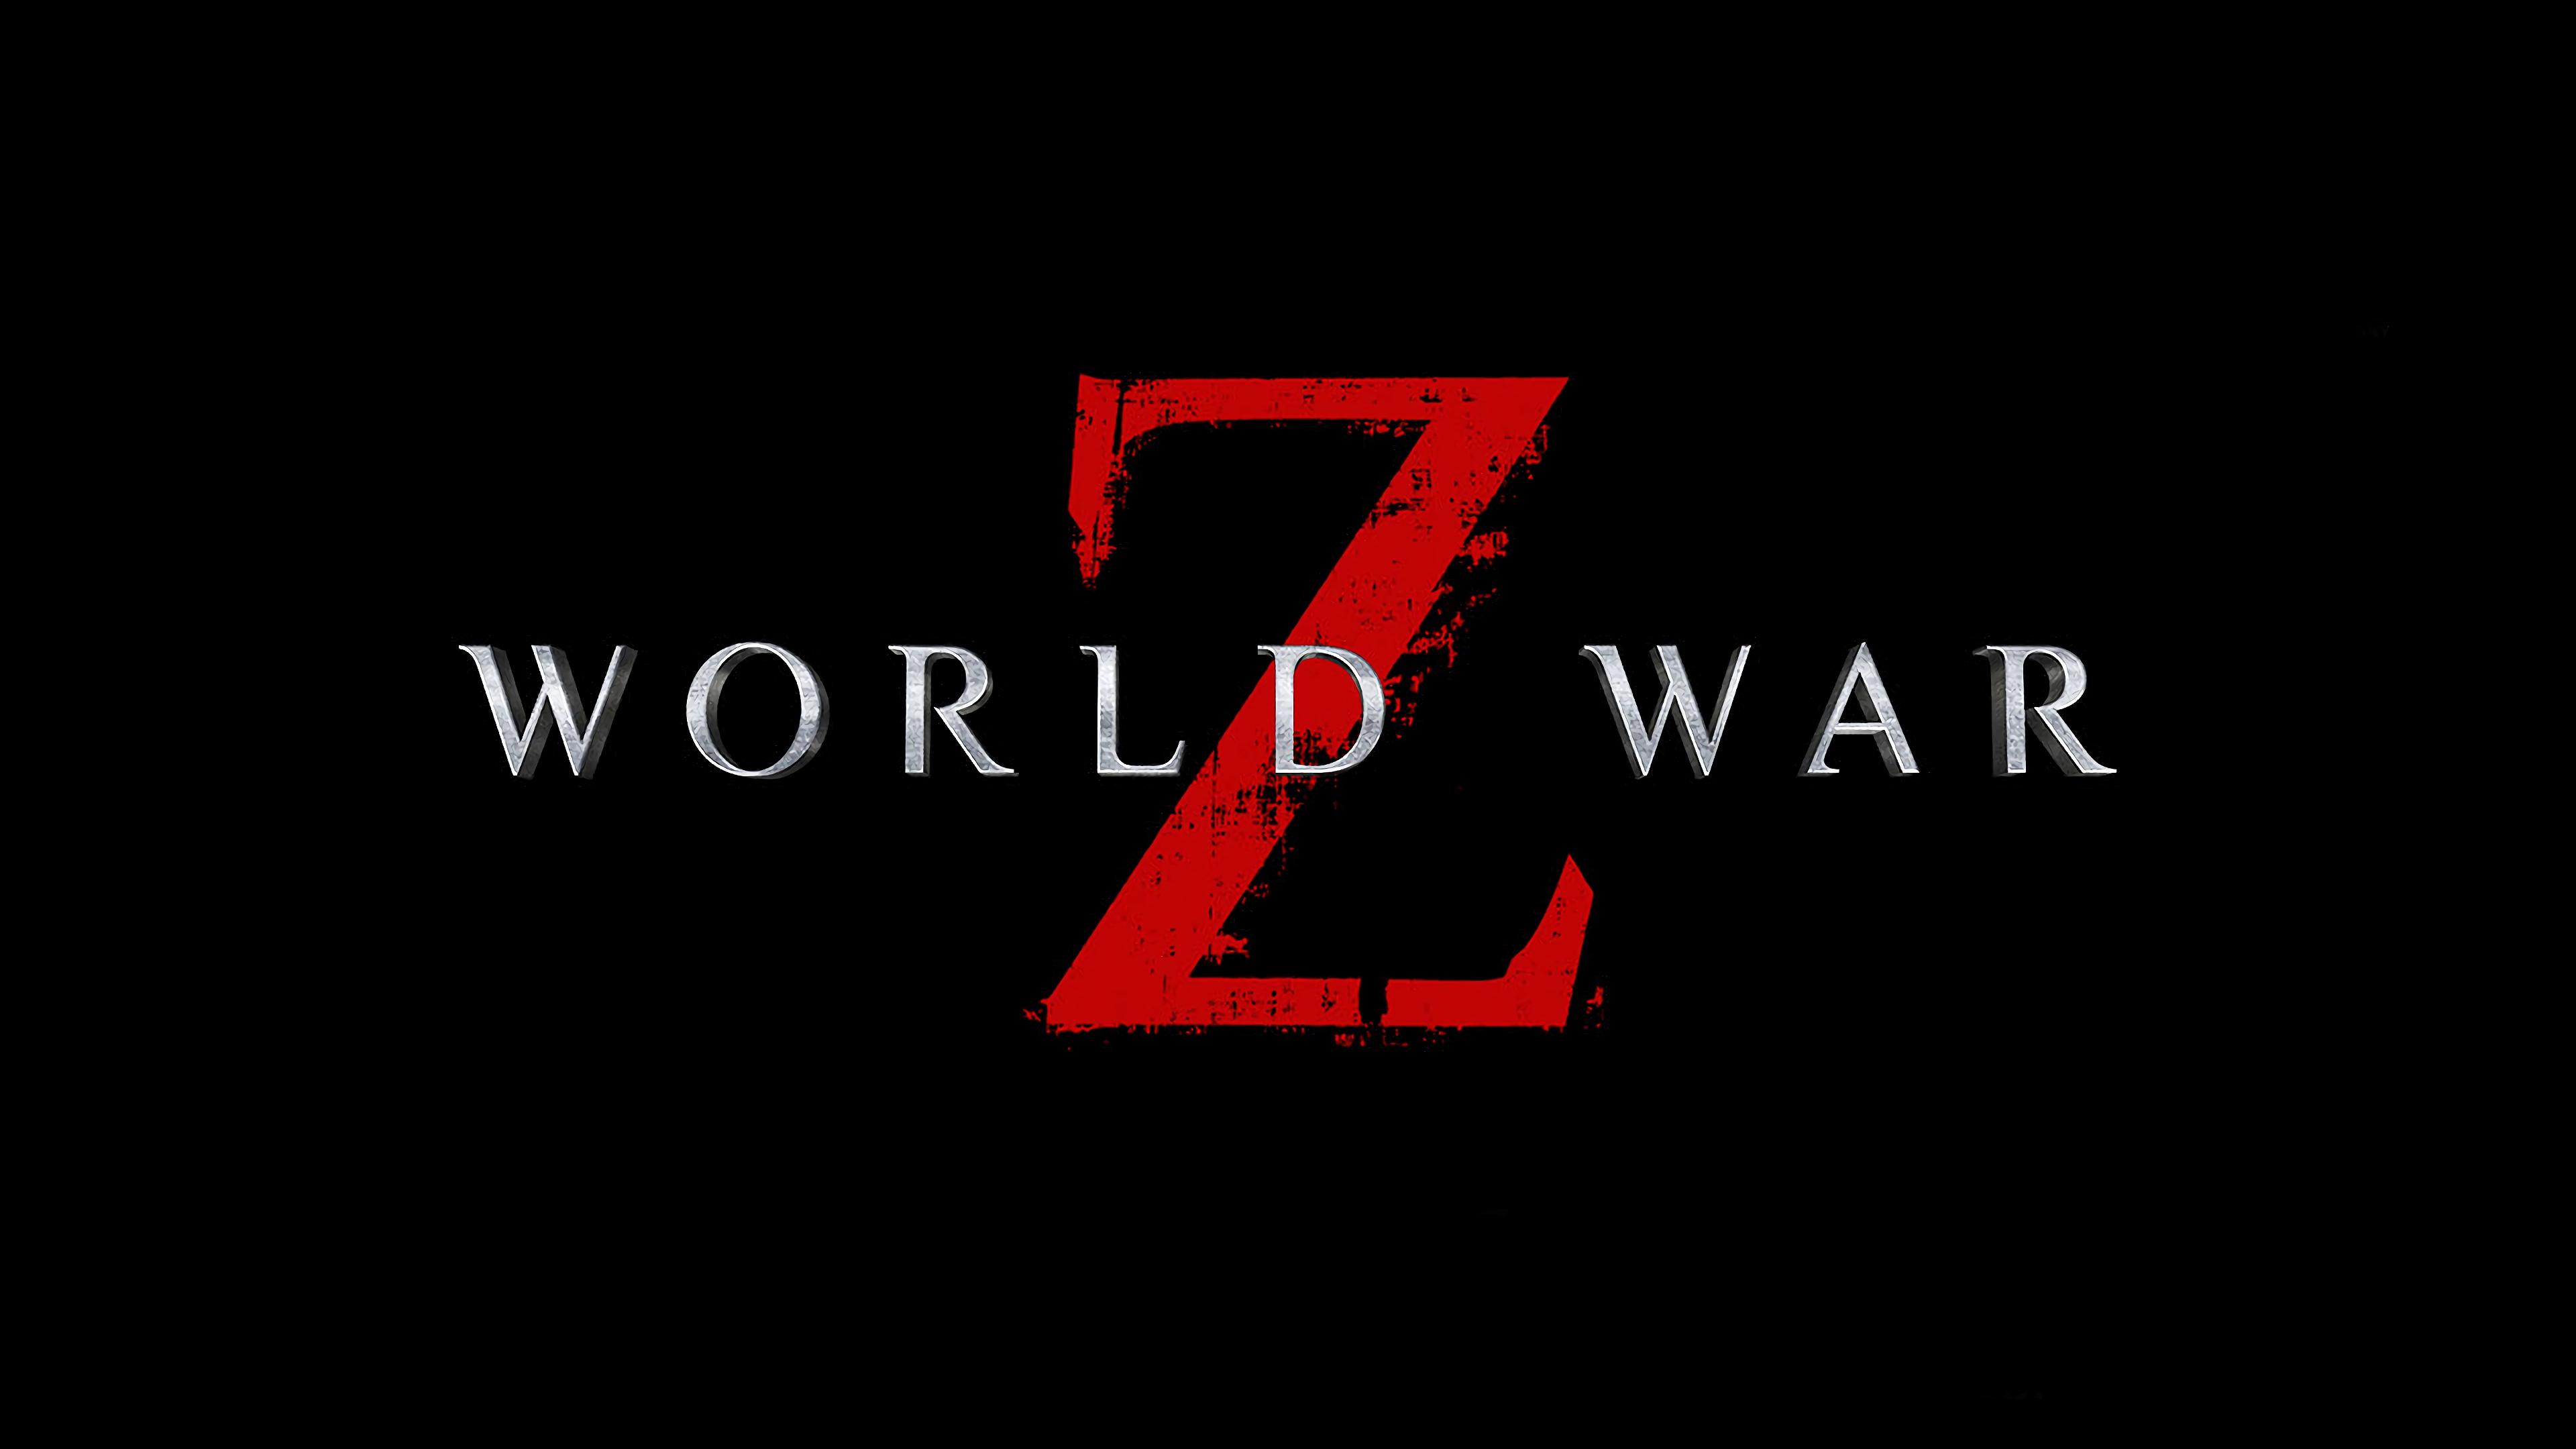 World War Z Video Game Logo 4K 13469 3840x2160